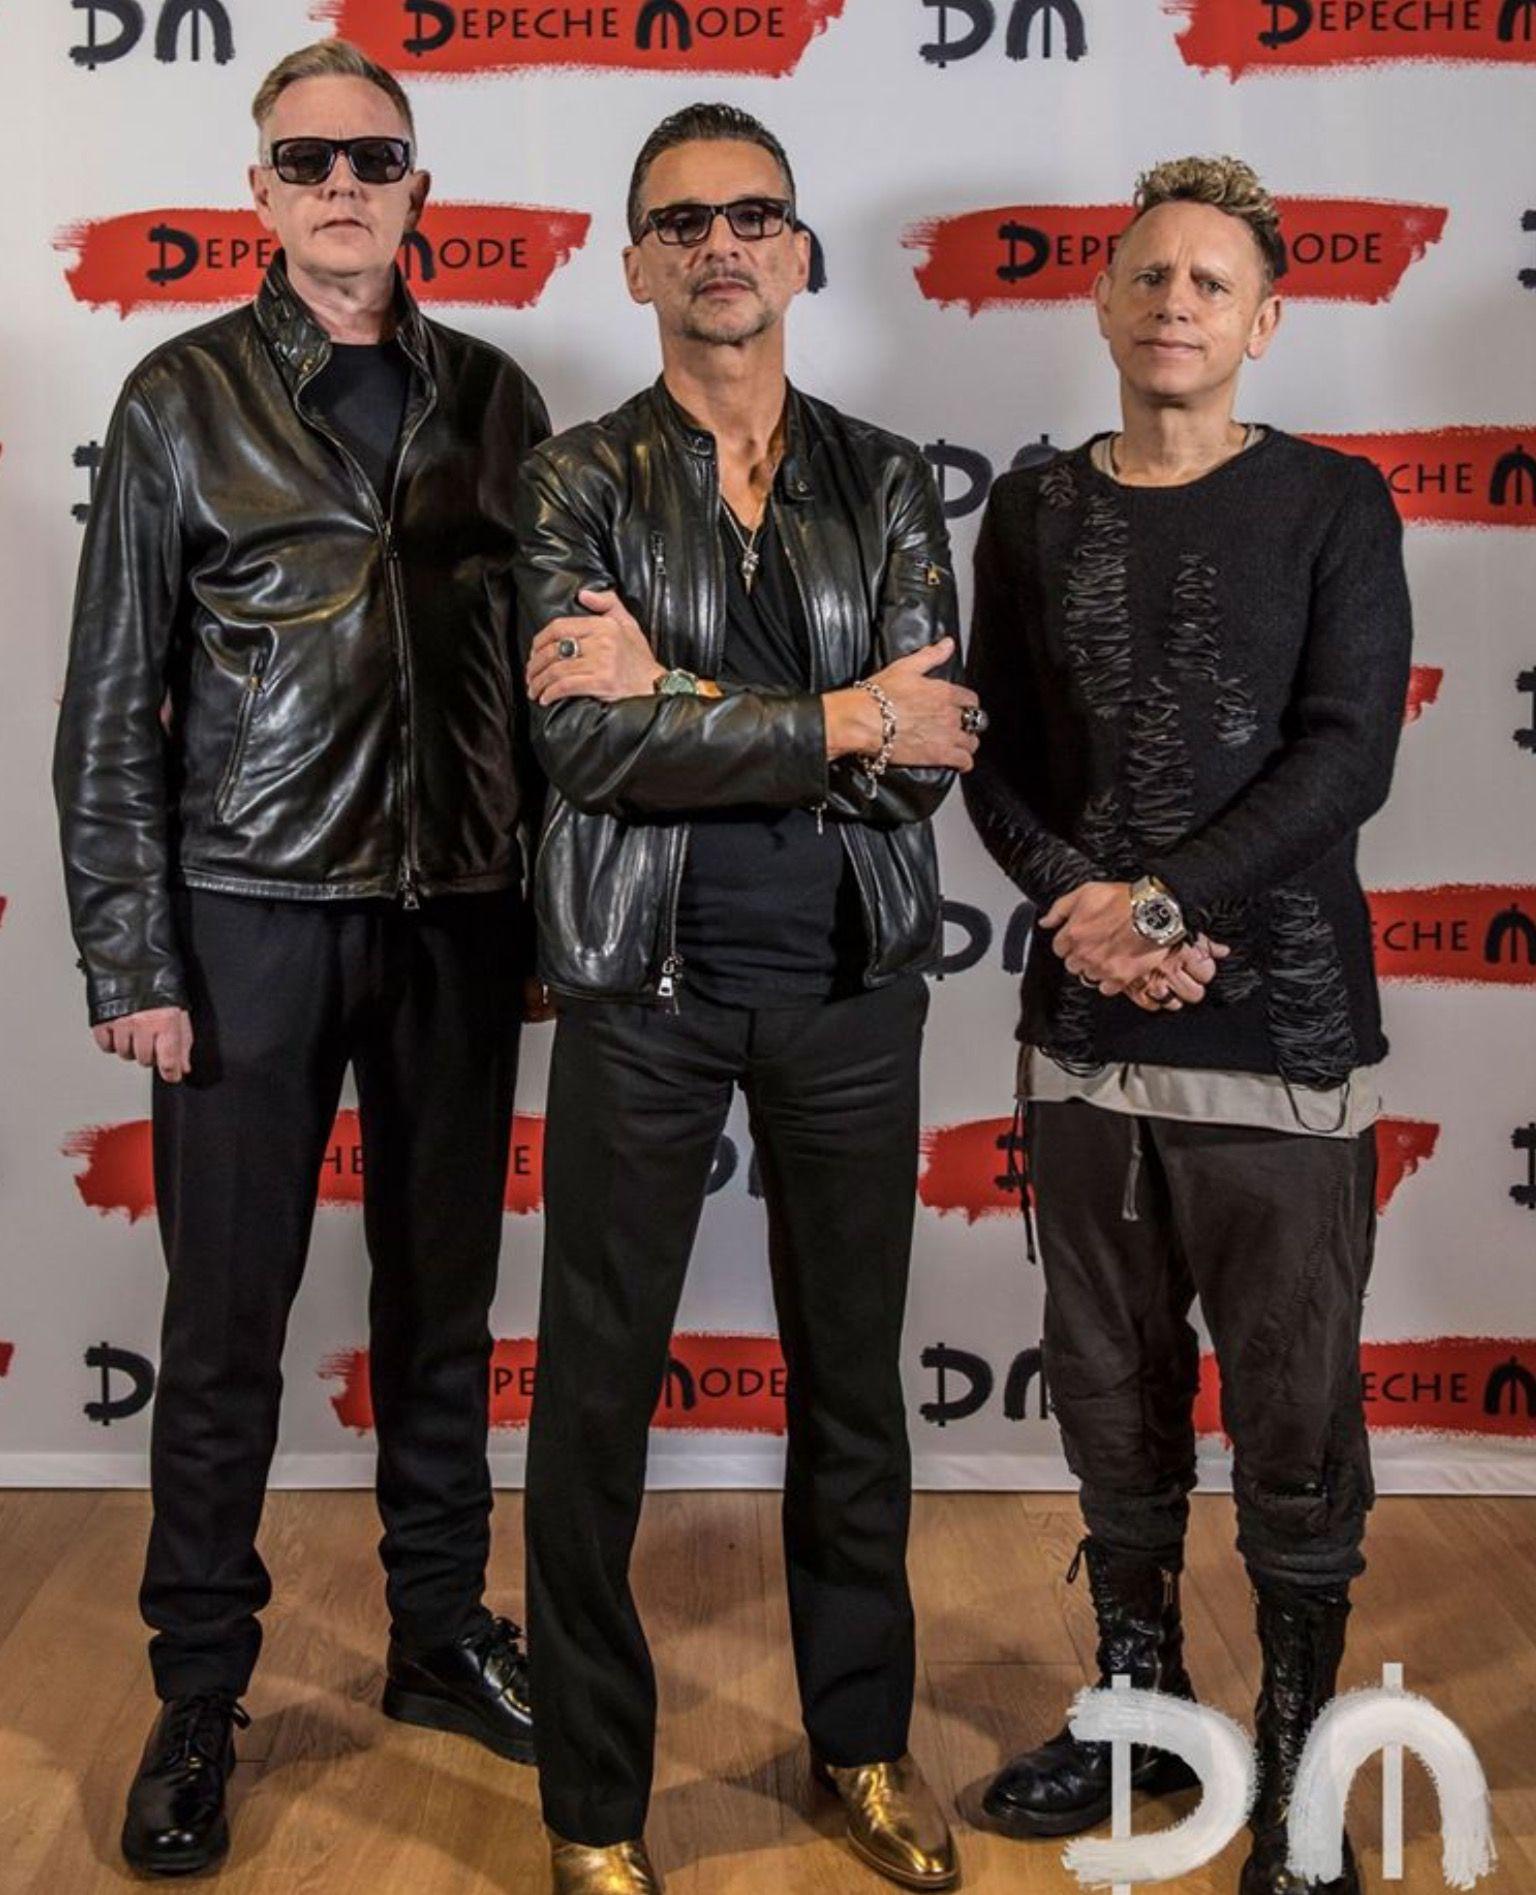 Depeche Mode by Francesco Prandoni